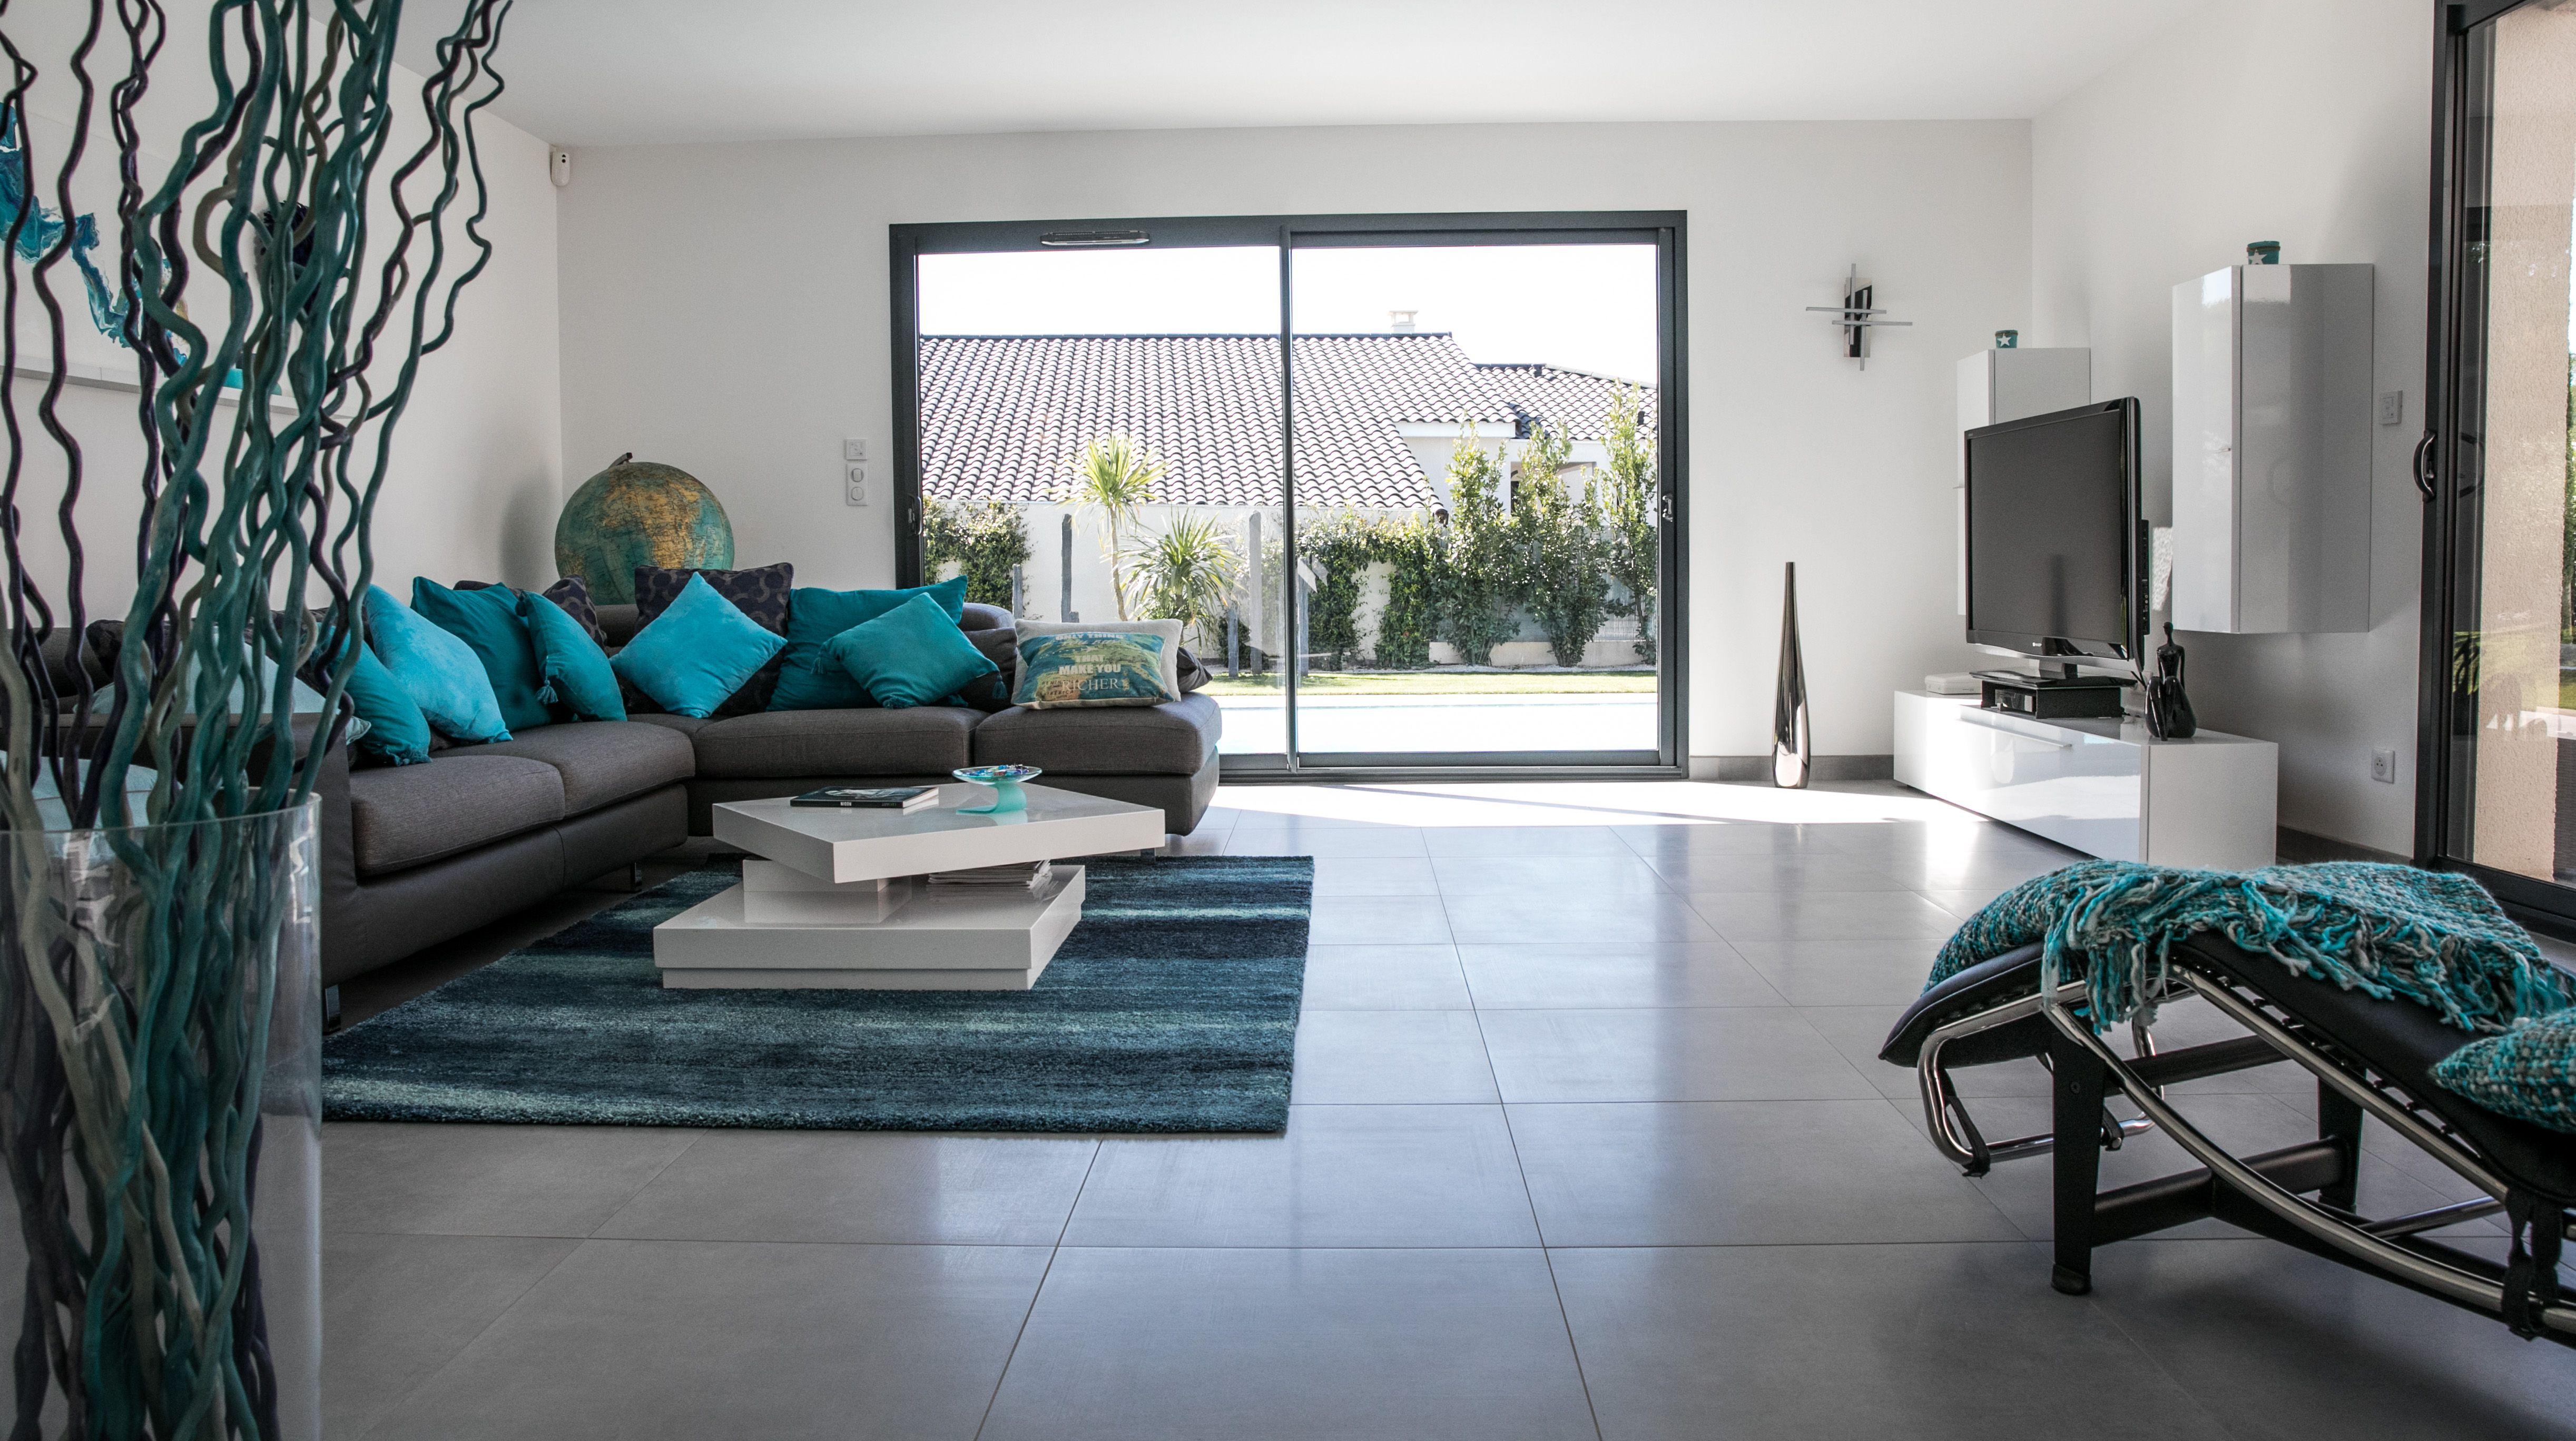 Design Interieur Grande Villa Contemporaine Maison Contemporaine Deco Maison Moderne Villa Contemporaine